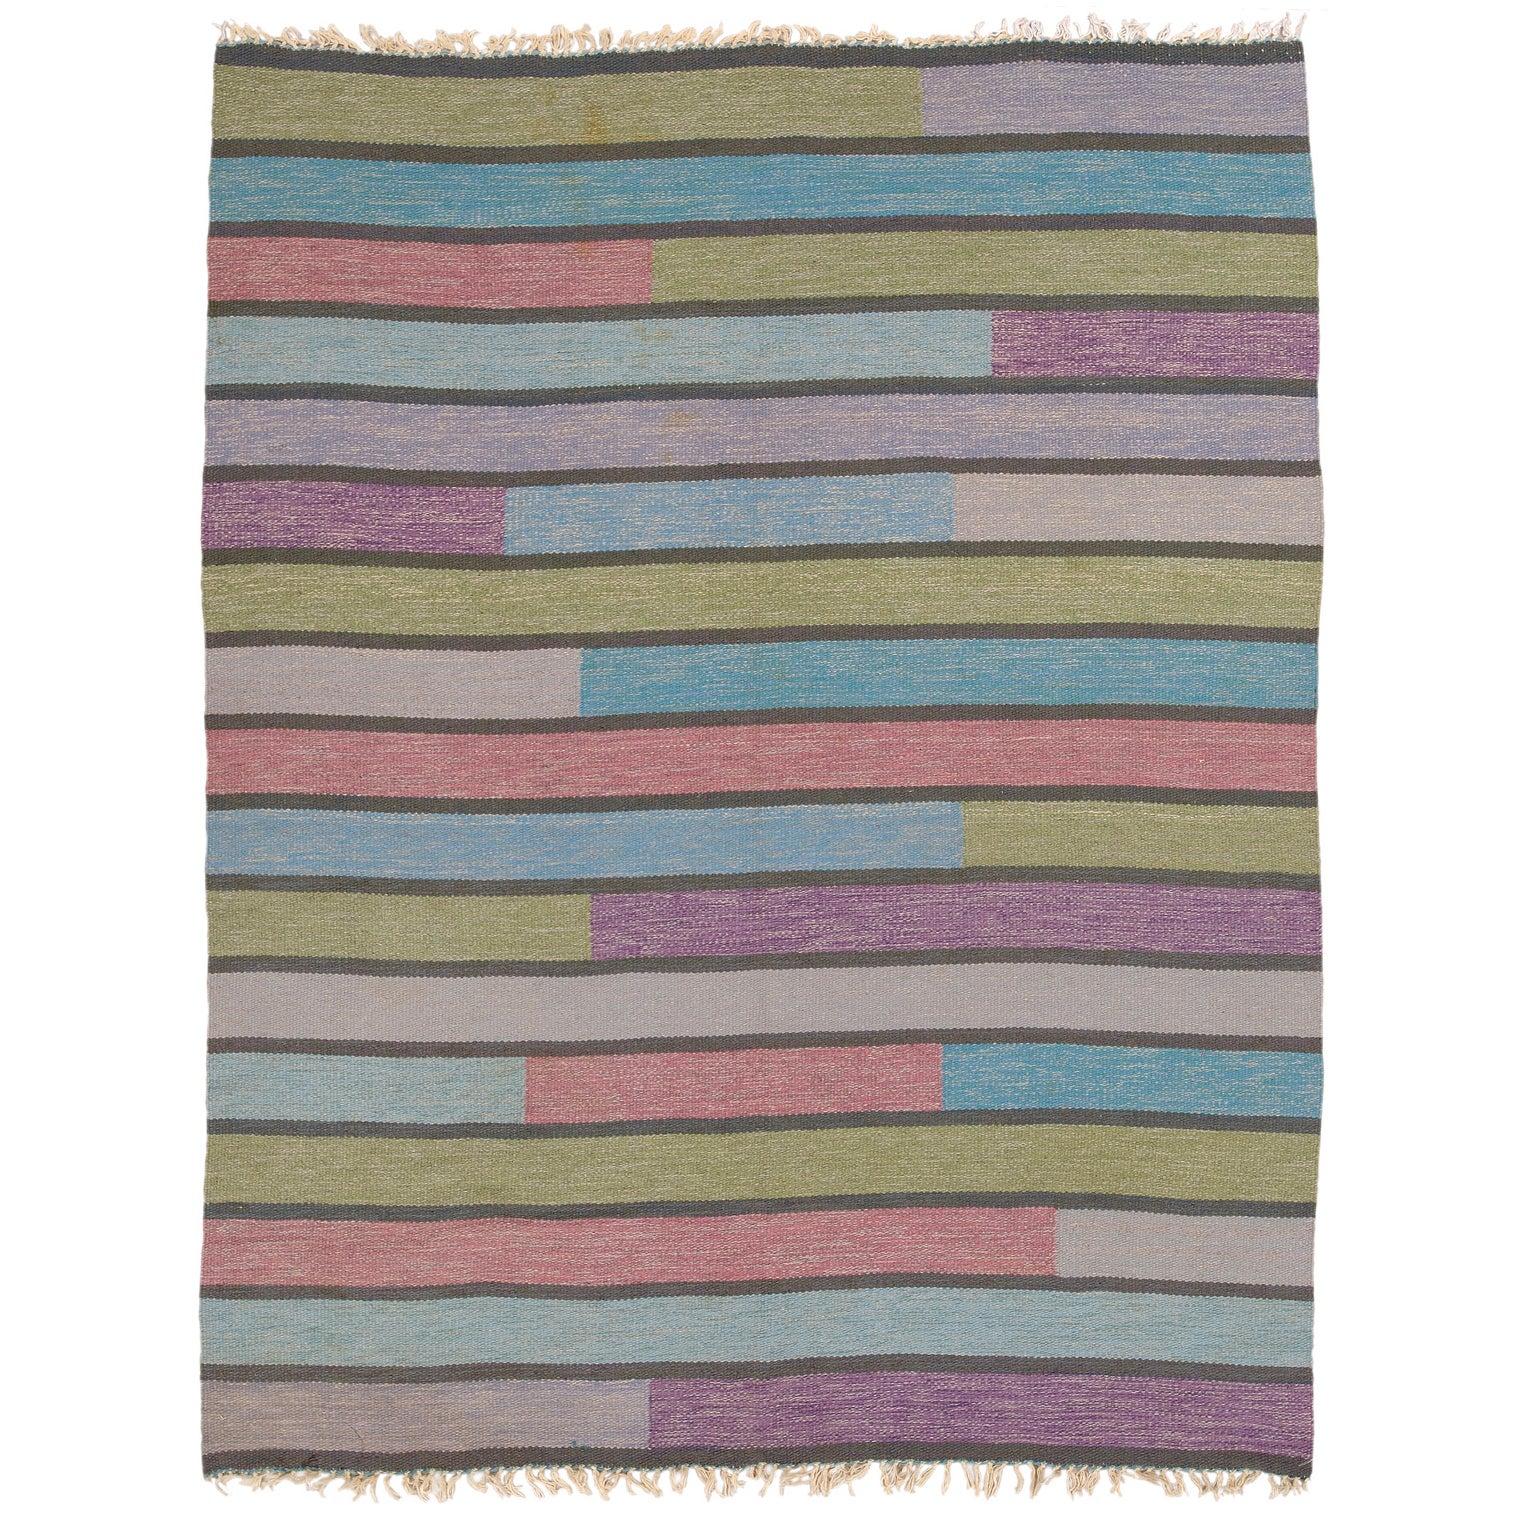 20th Century Swedish Flat-Weave Carpet by Ingrid Hellman-Knafve